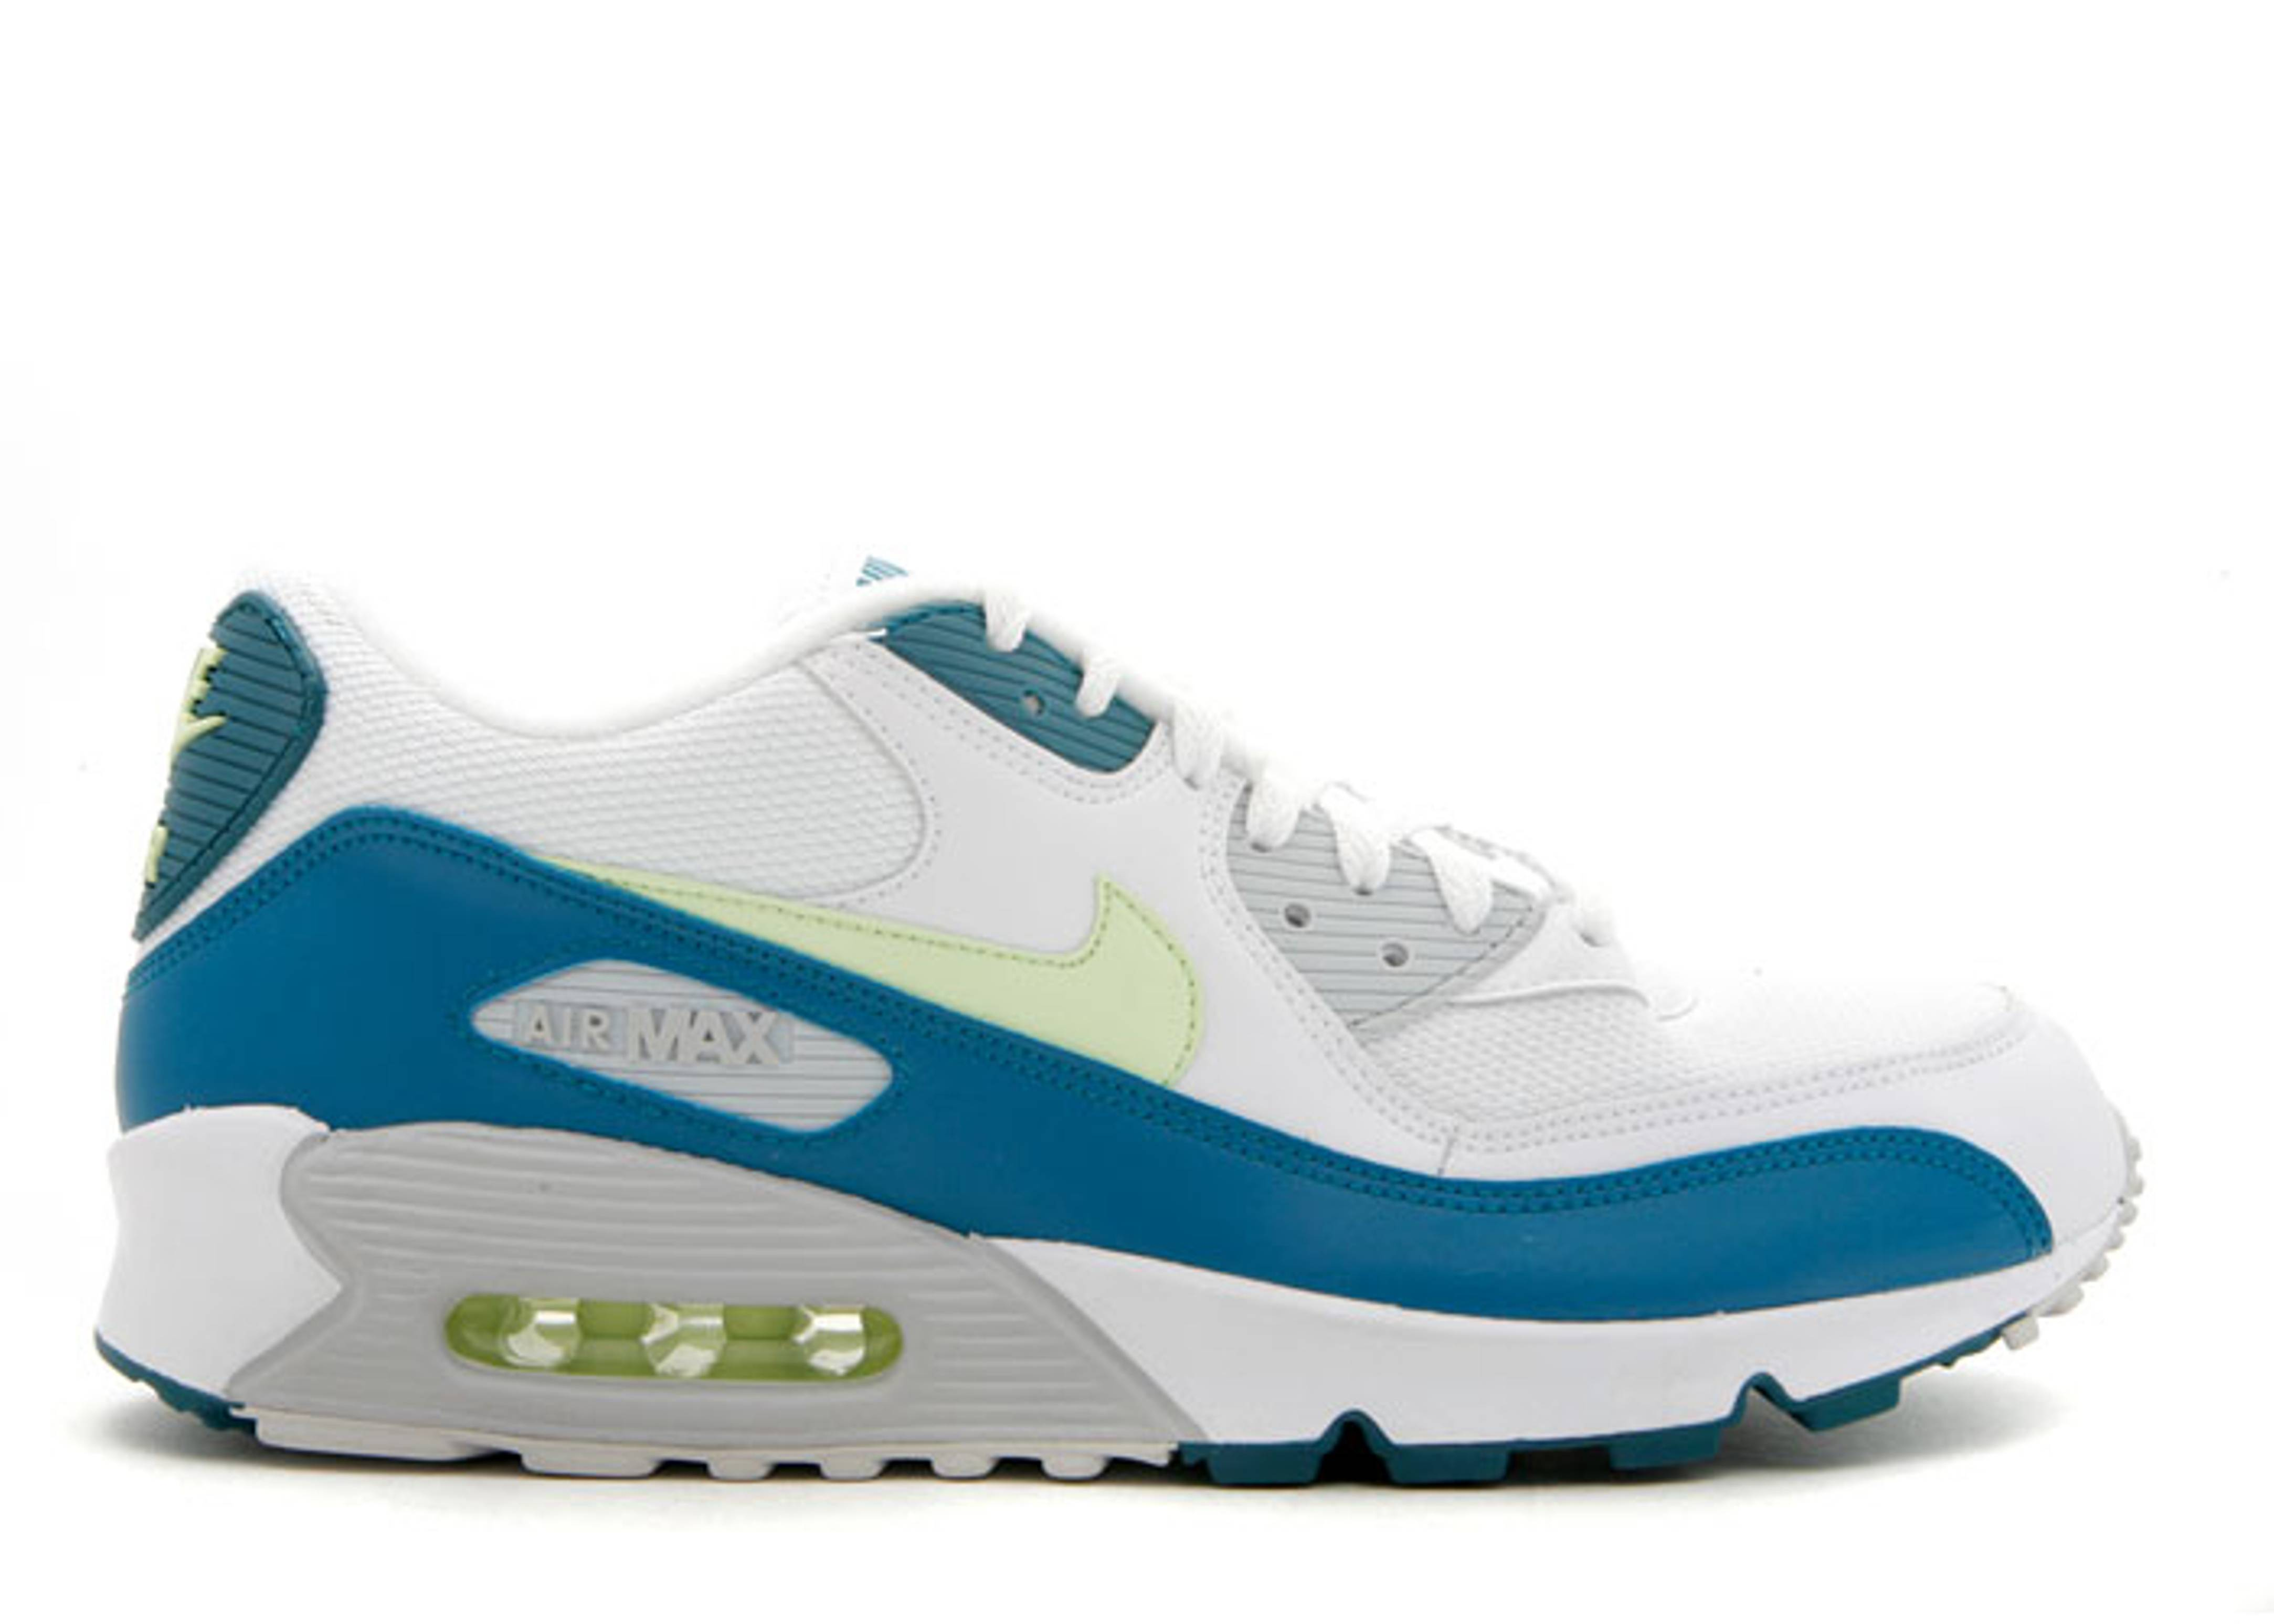 9ec6e4cfeeaa Air Max 90 - Nike - 309299 132 - white ht lm-dark sprc-ntrl grey ...